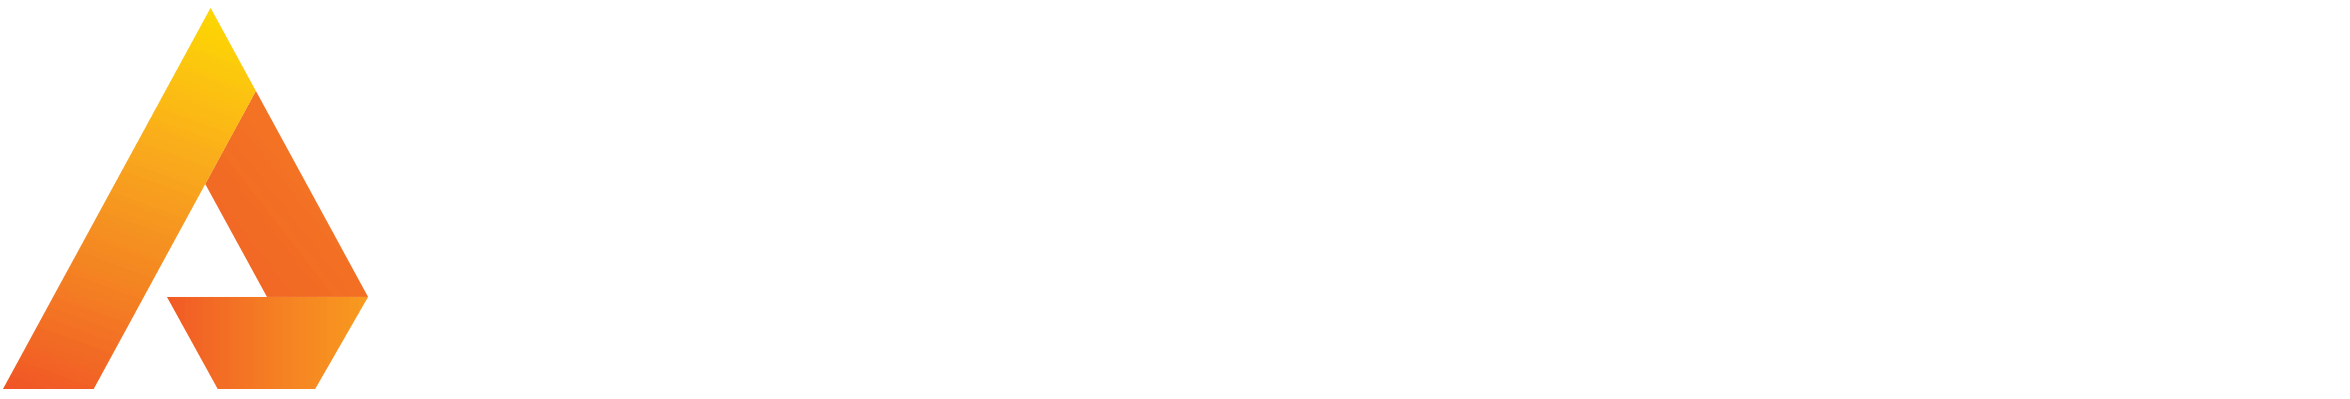 Atomic Access Fibre Internet Dark Logo